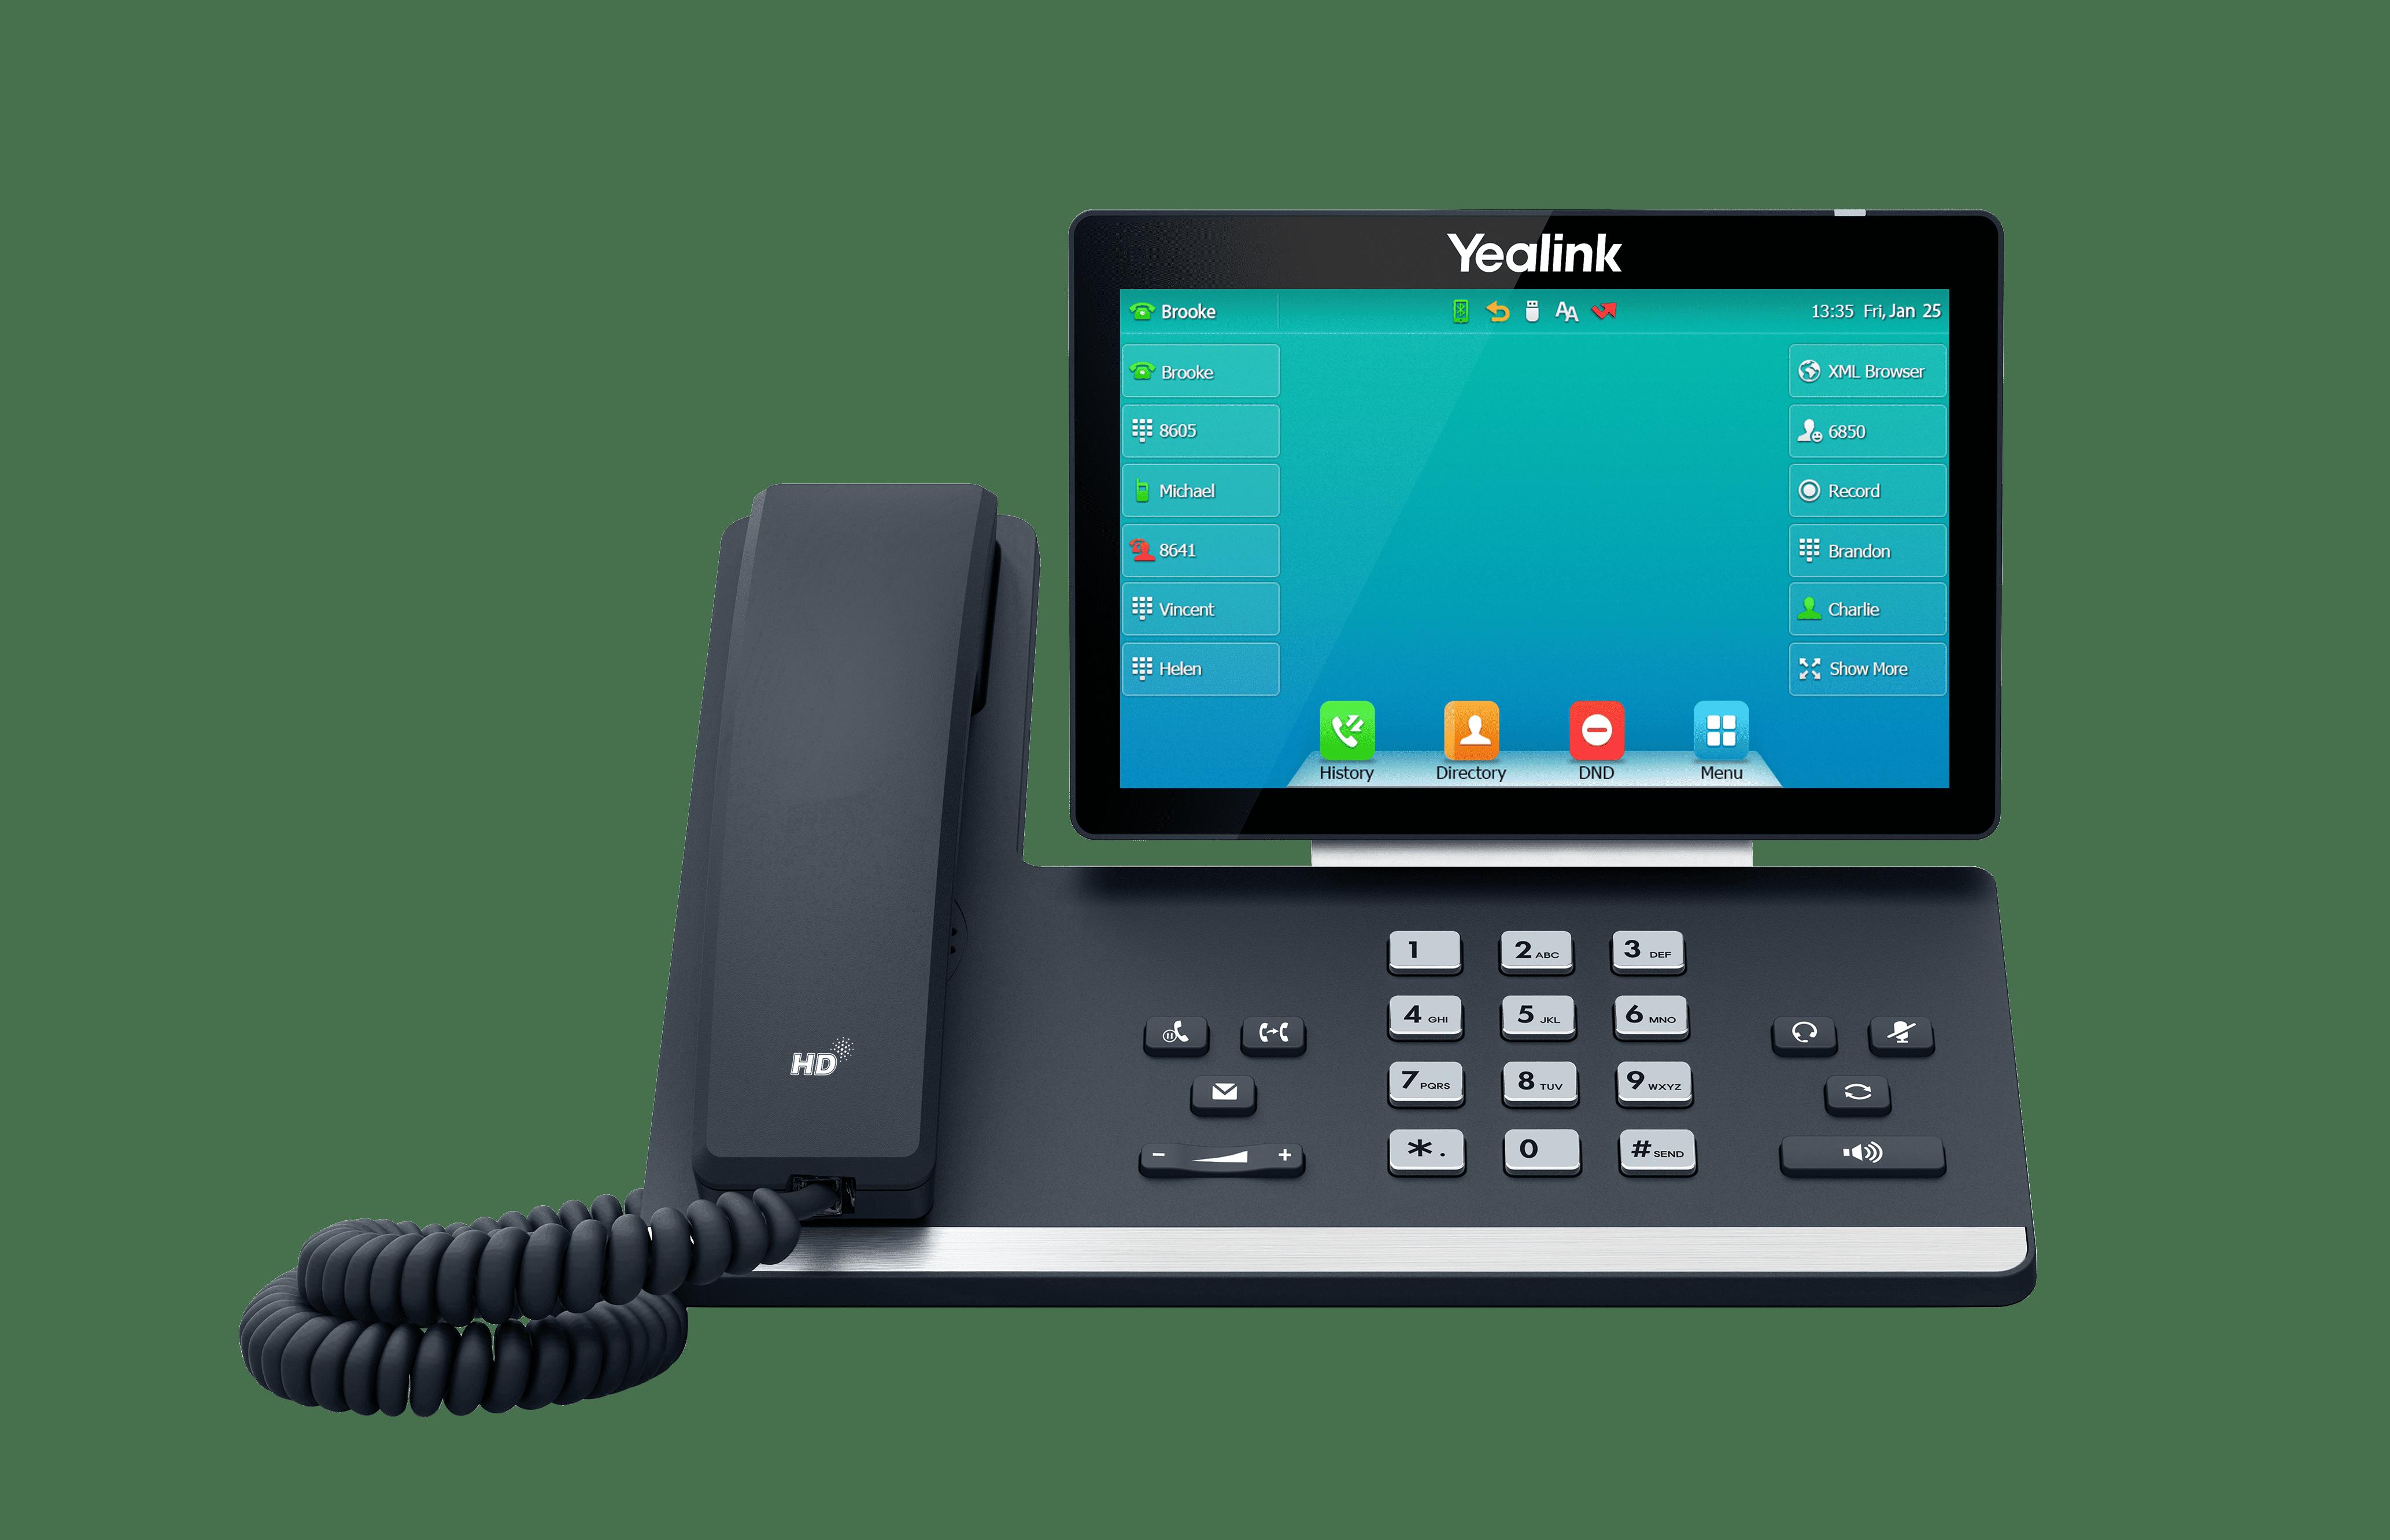 Yealink T57W Model Phone